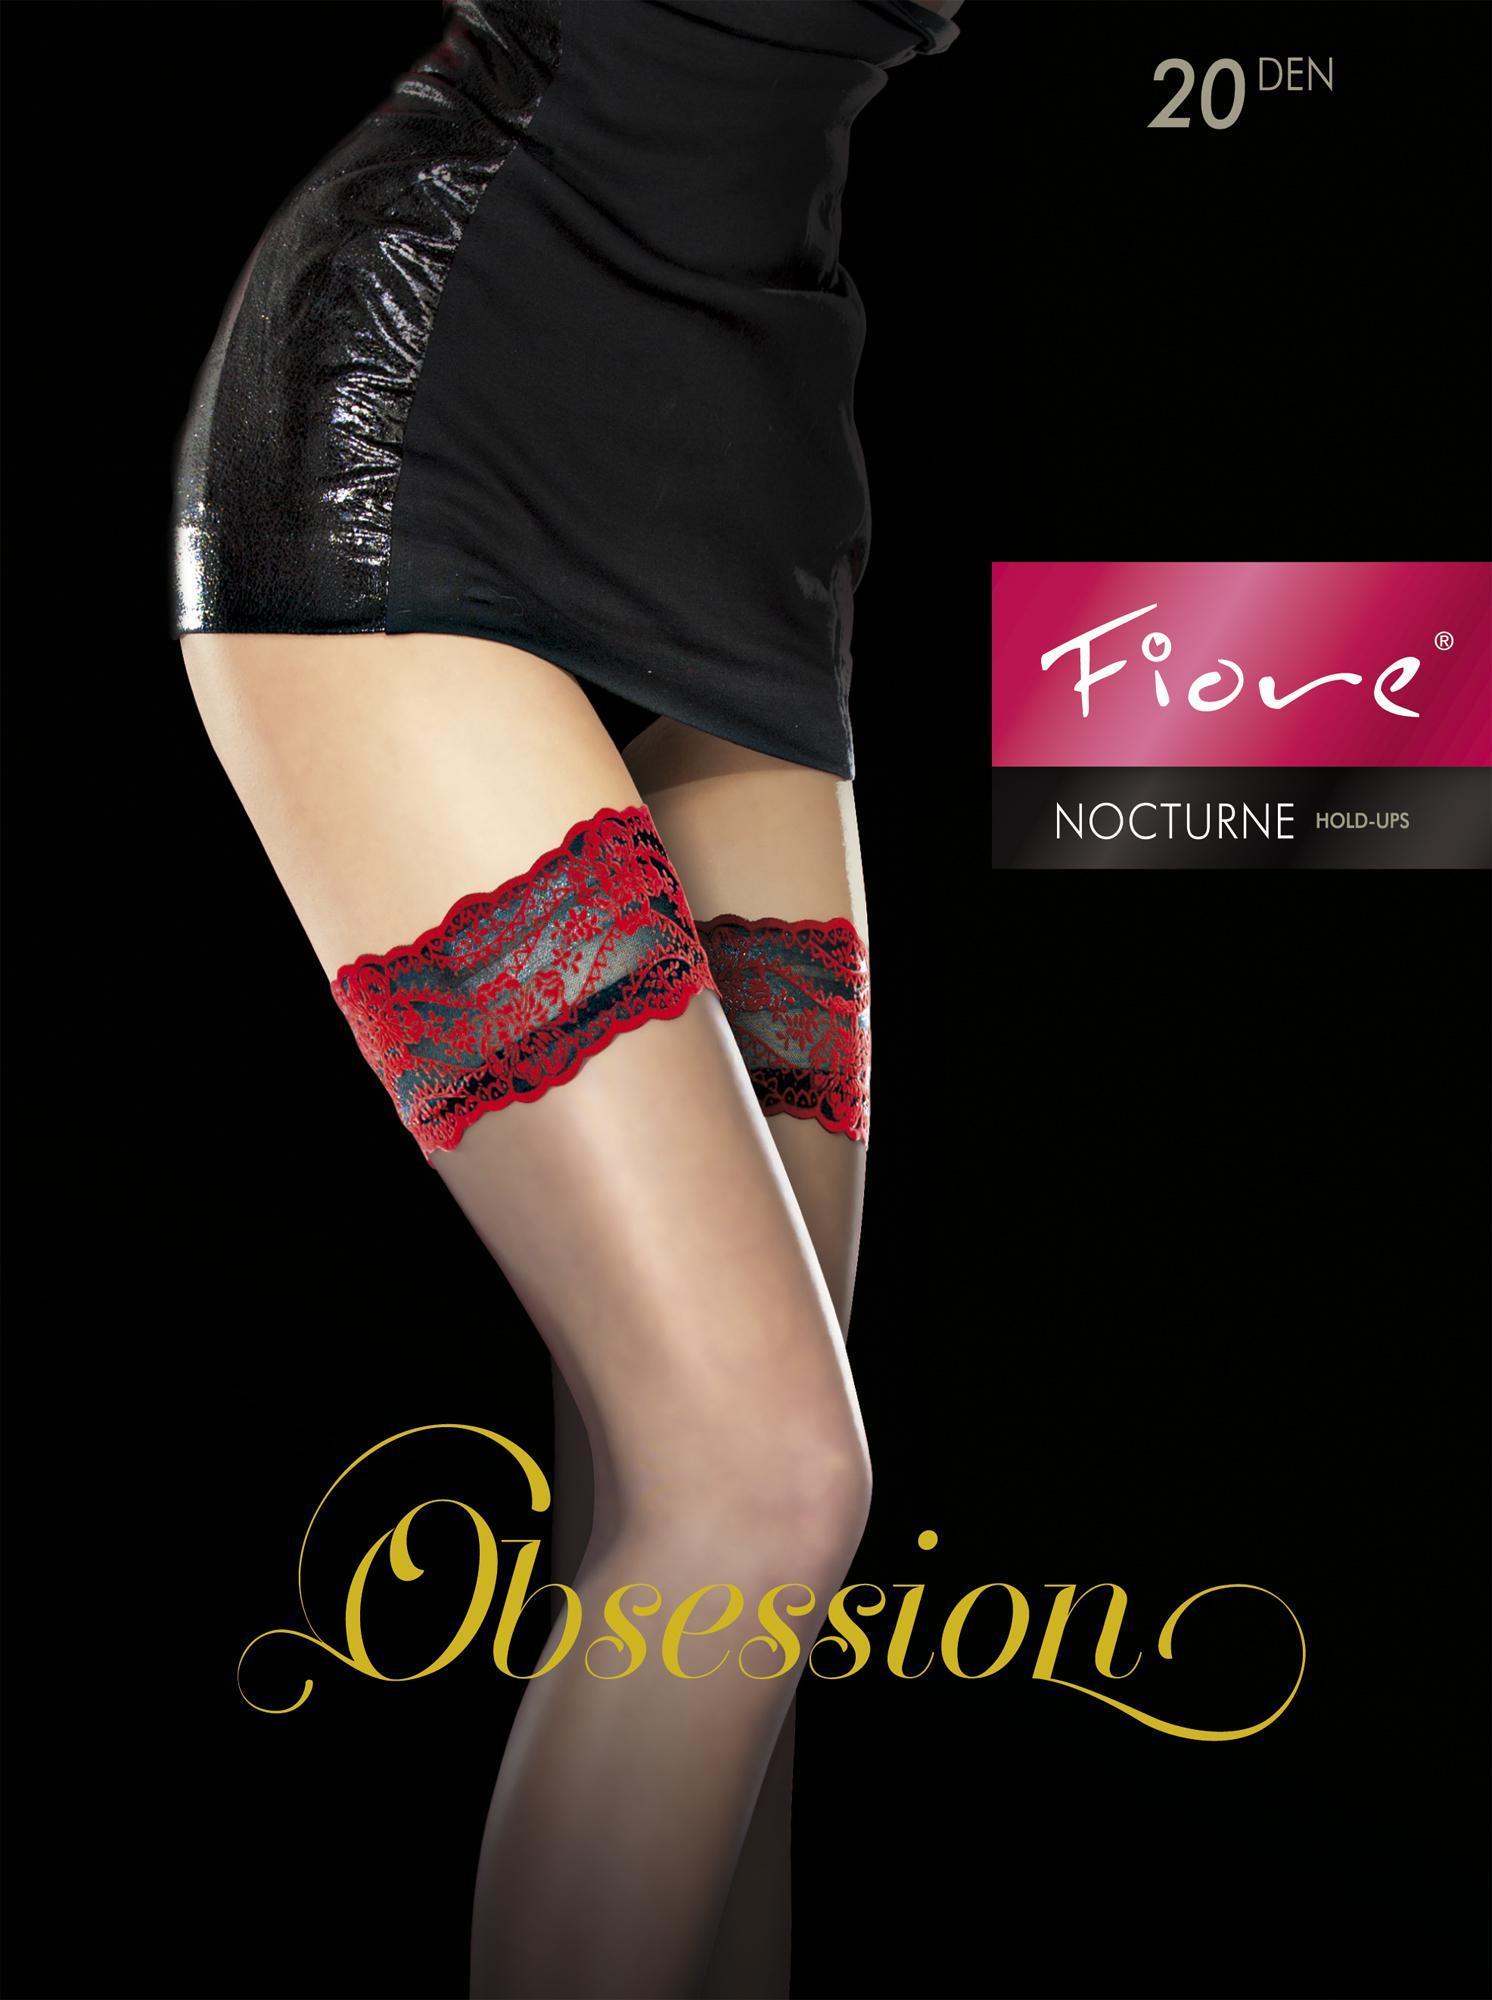 Seductive Fiore Obsession Exclusive Tenebra 20 Denier Sheer Lace Top Hold Ups